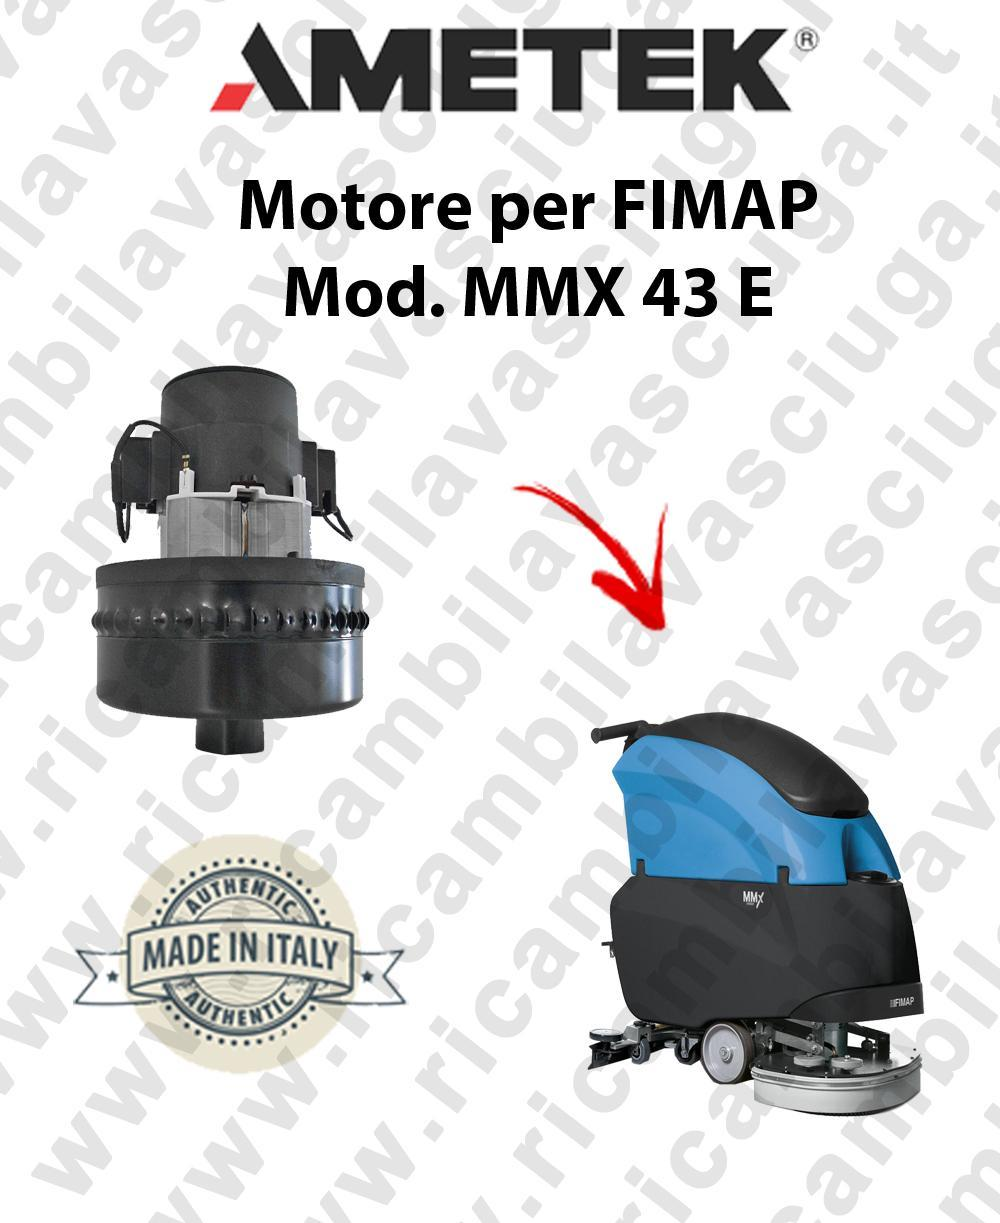 MMX 43 E Ametek Vacuum Motor scrubber dryer FIMAP